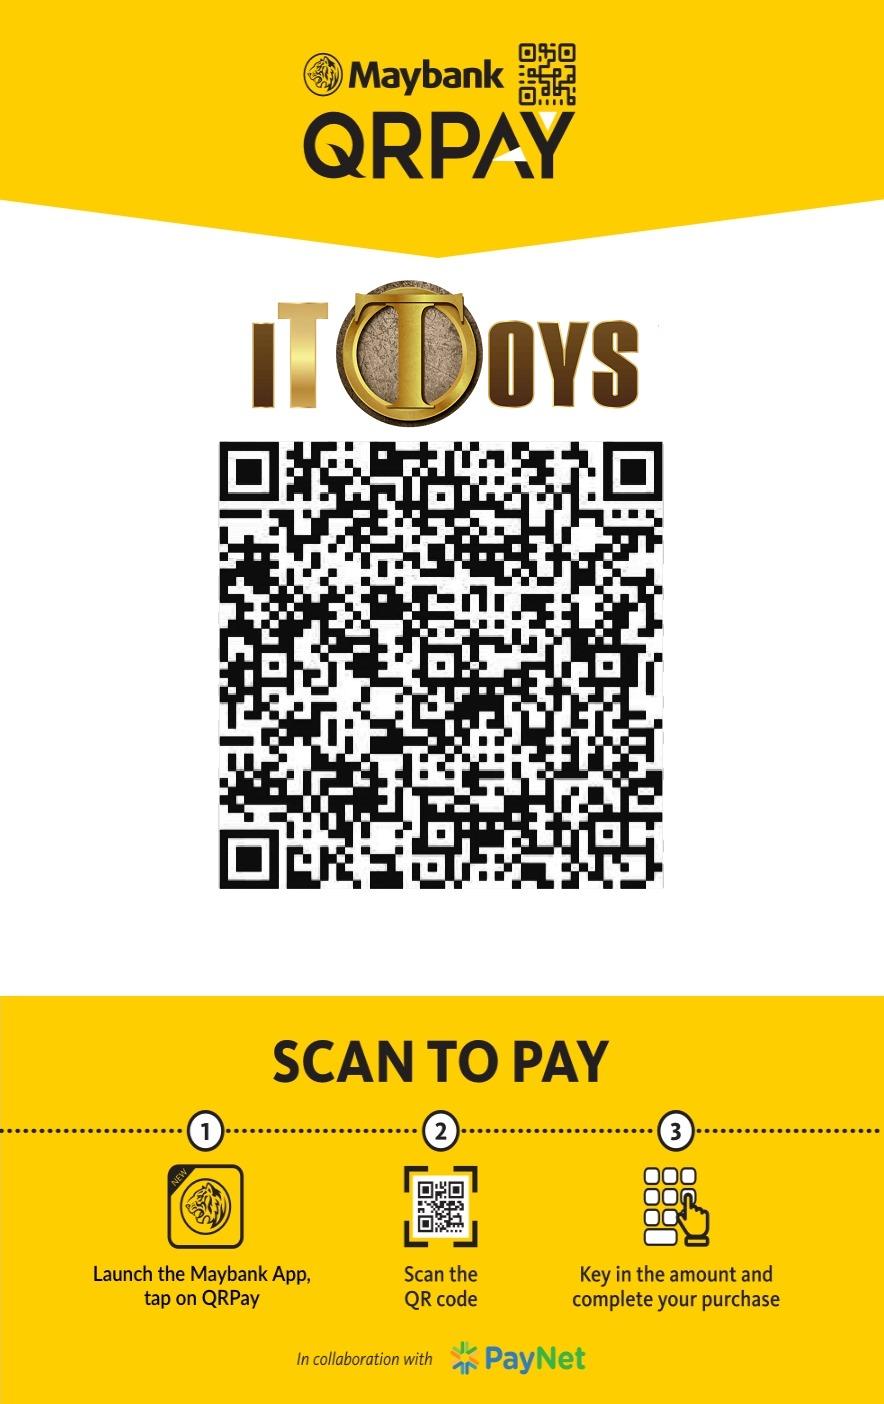 https://ittoysline.com/images/MaybankQRPay.jpg